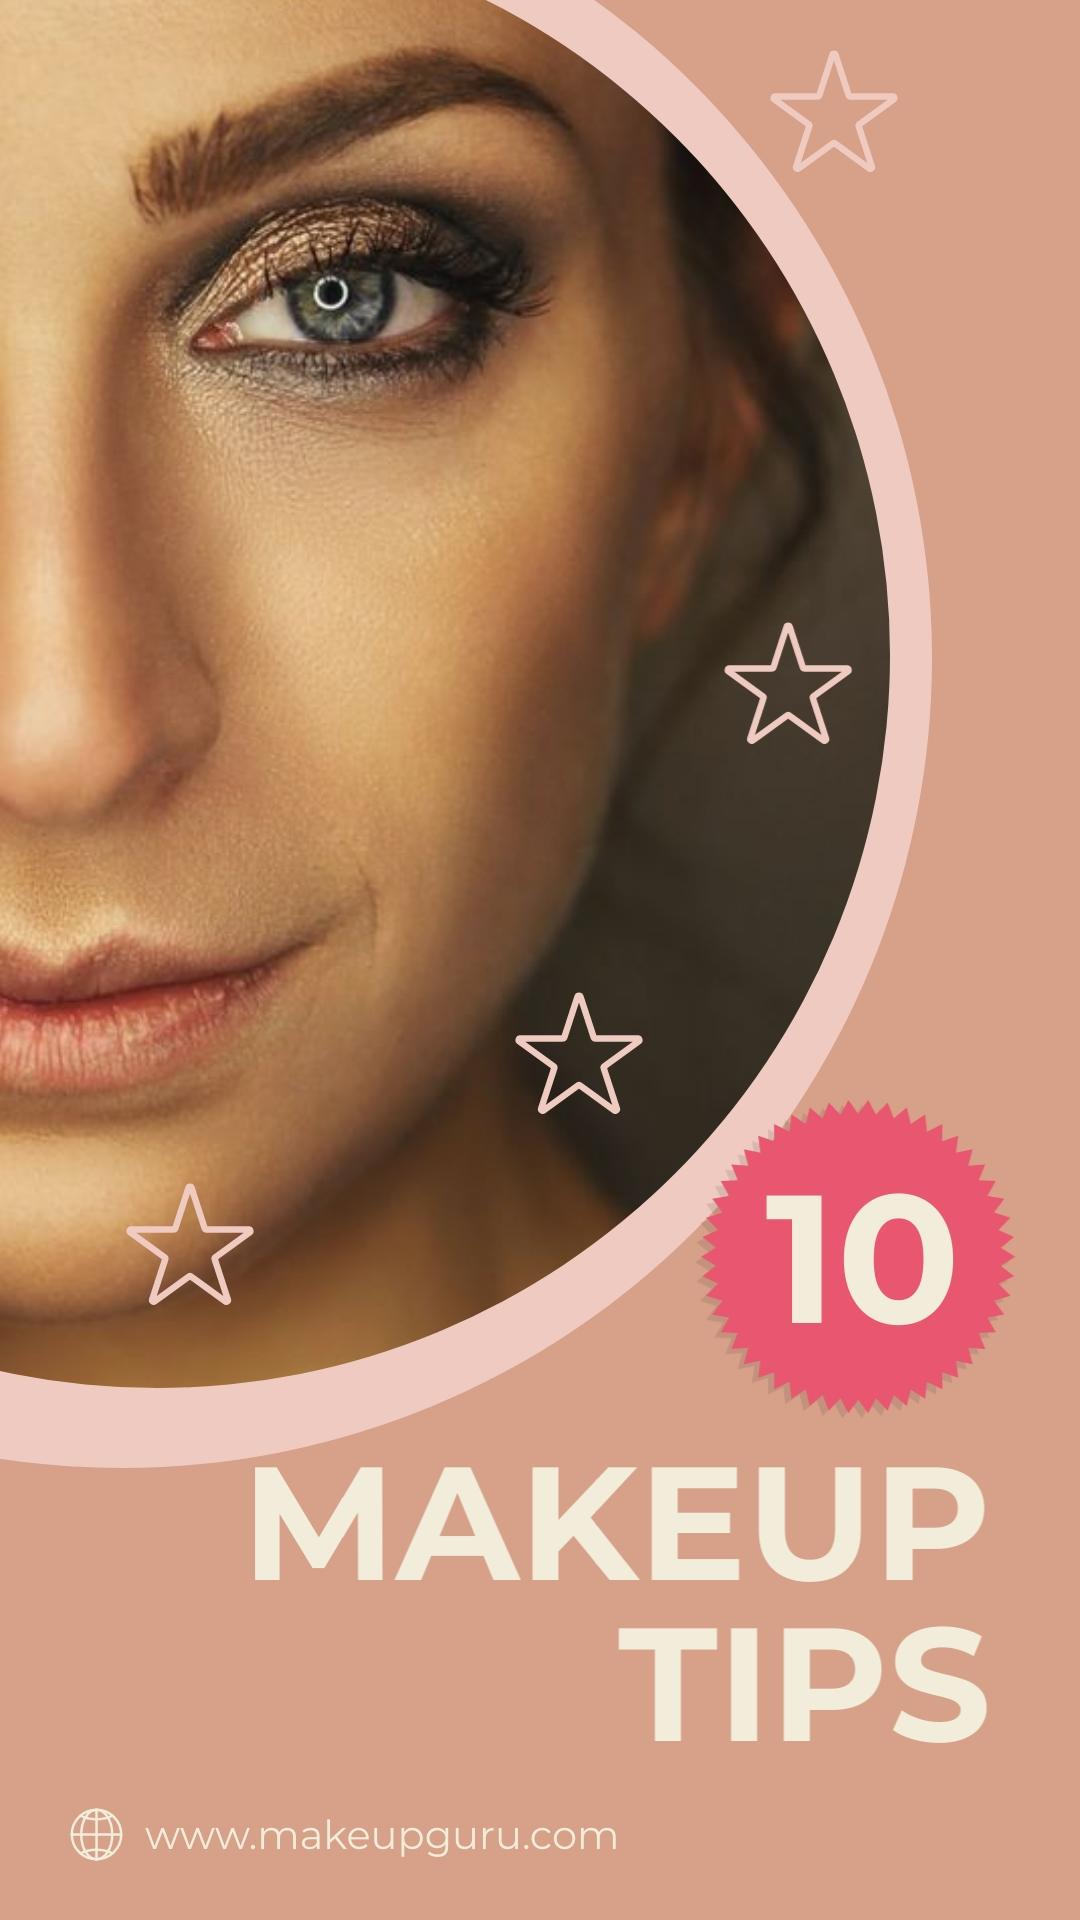 Makeup Tips Pinterest Video Pin Template